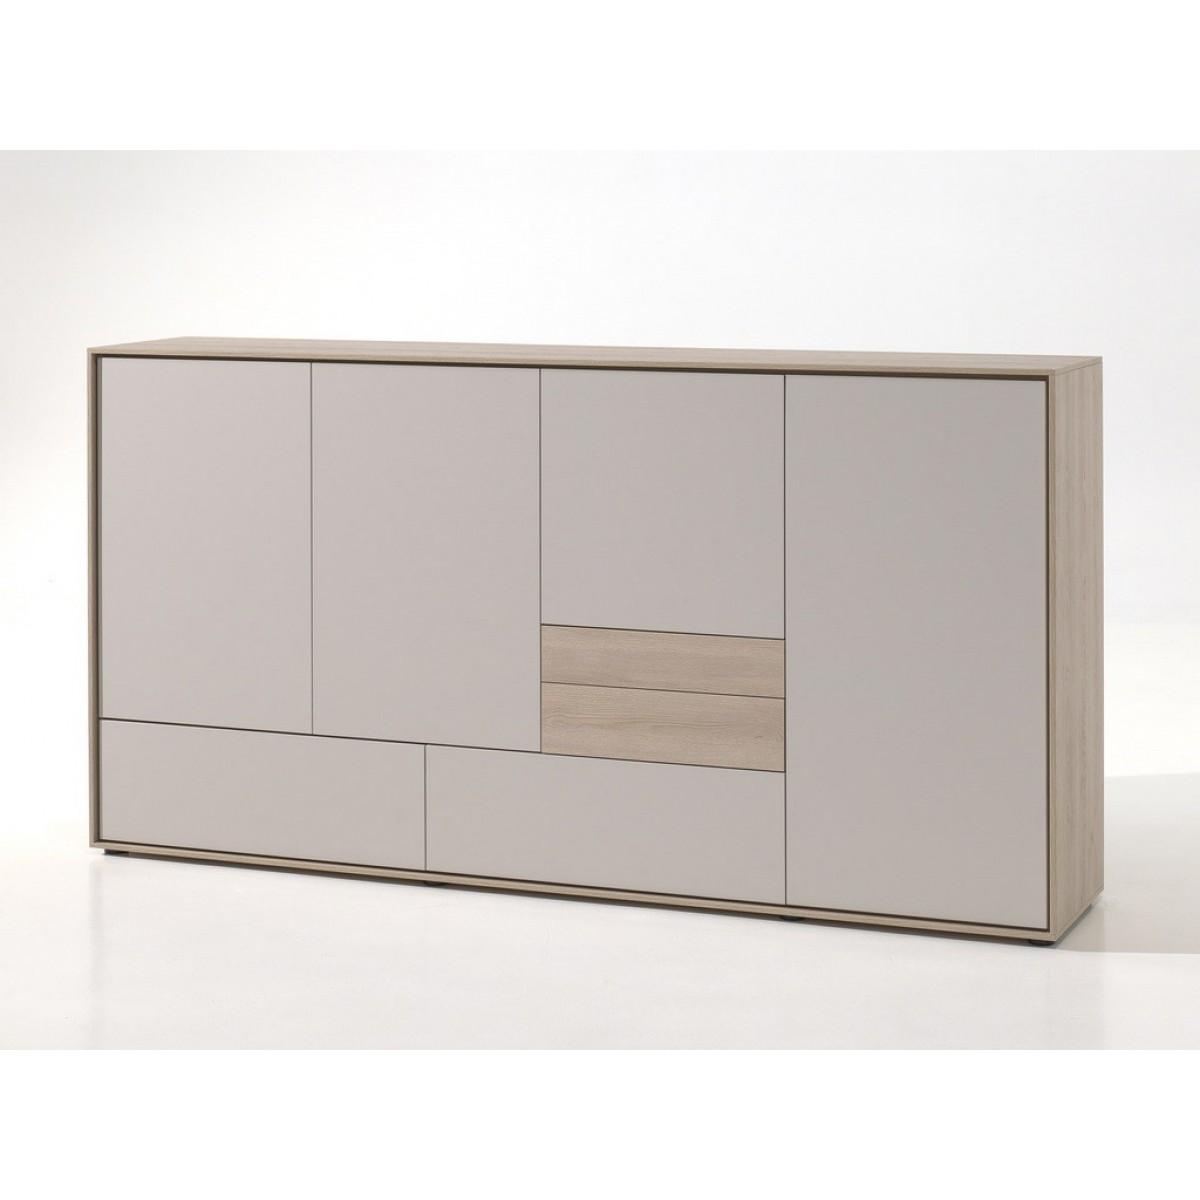 kyara-dressoir-dressette-c0054c-cashmere